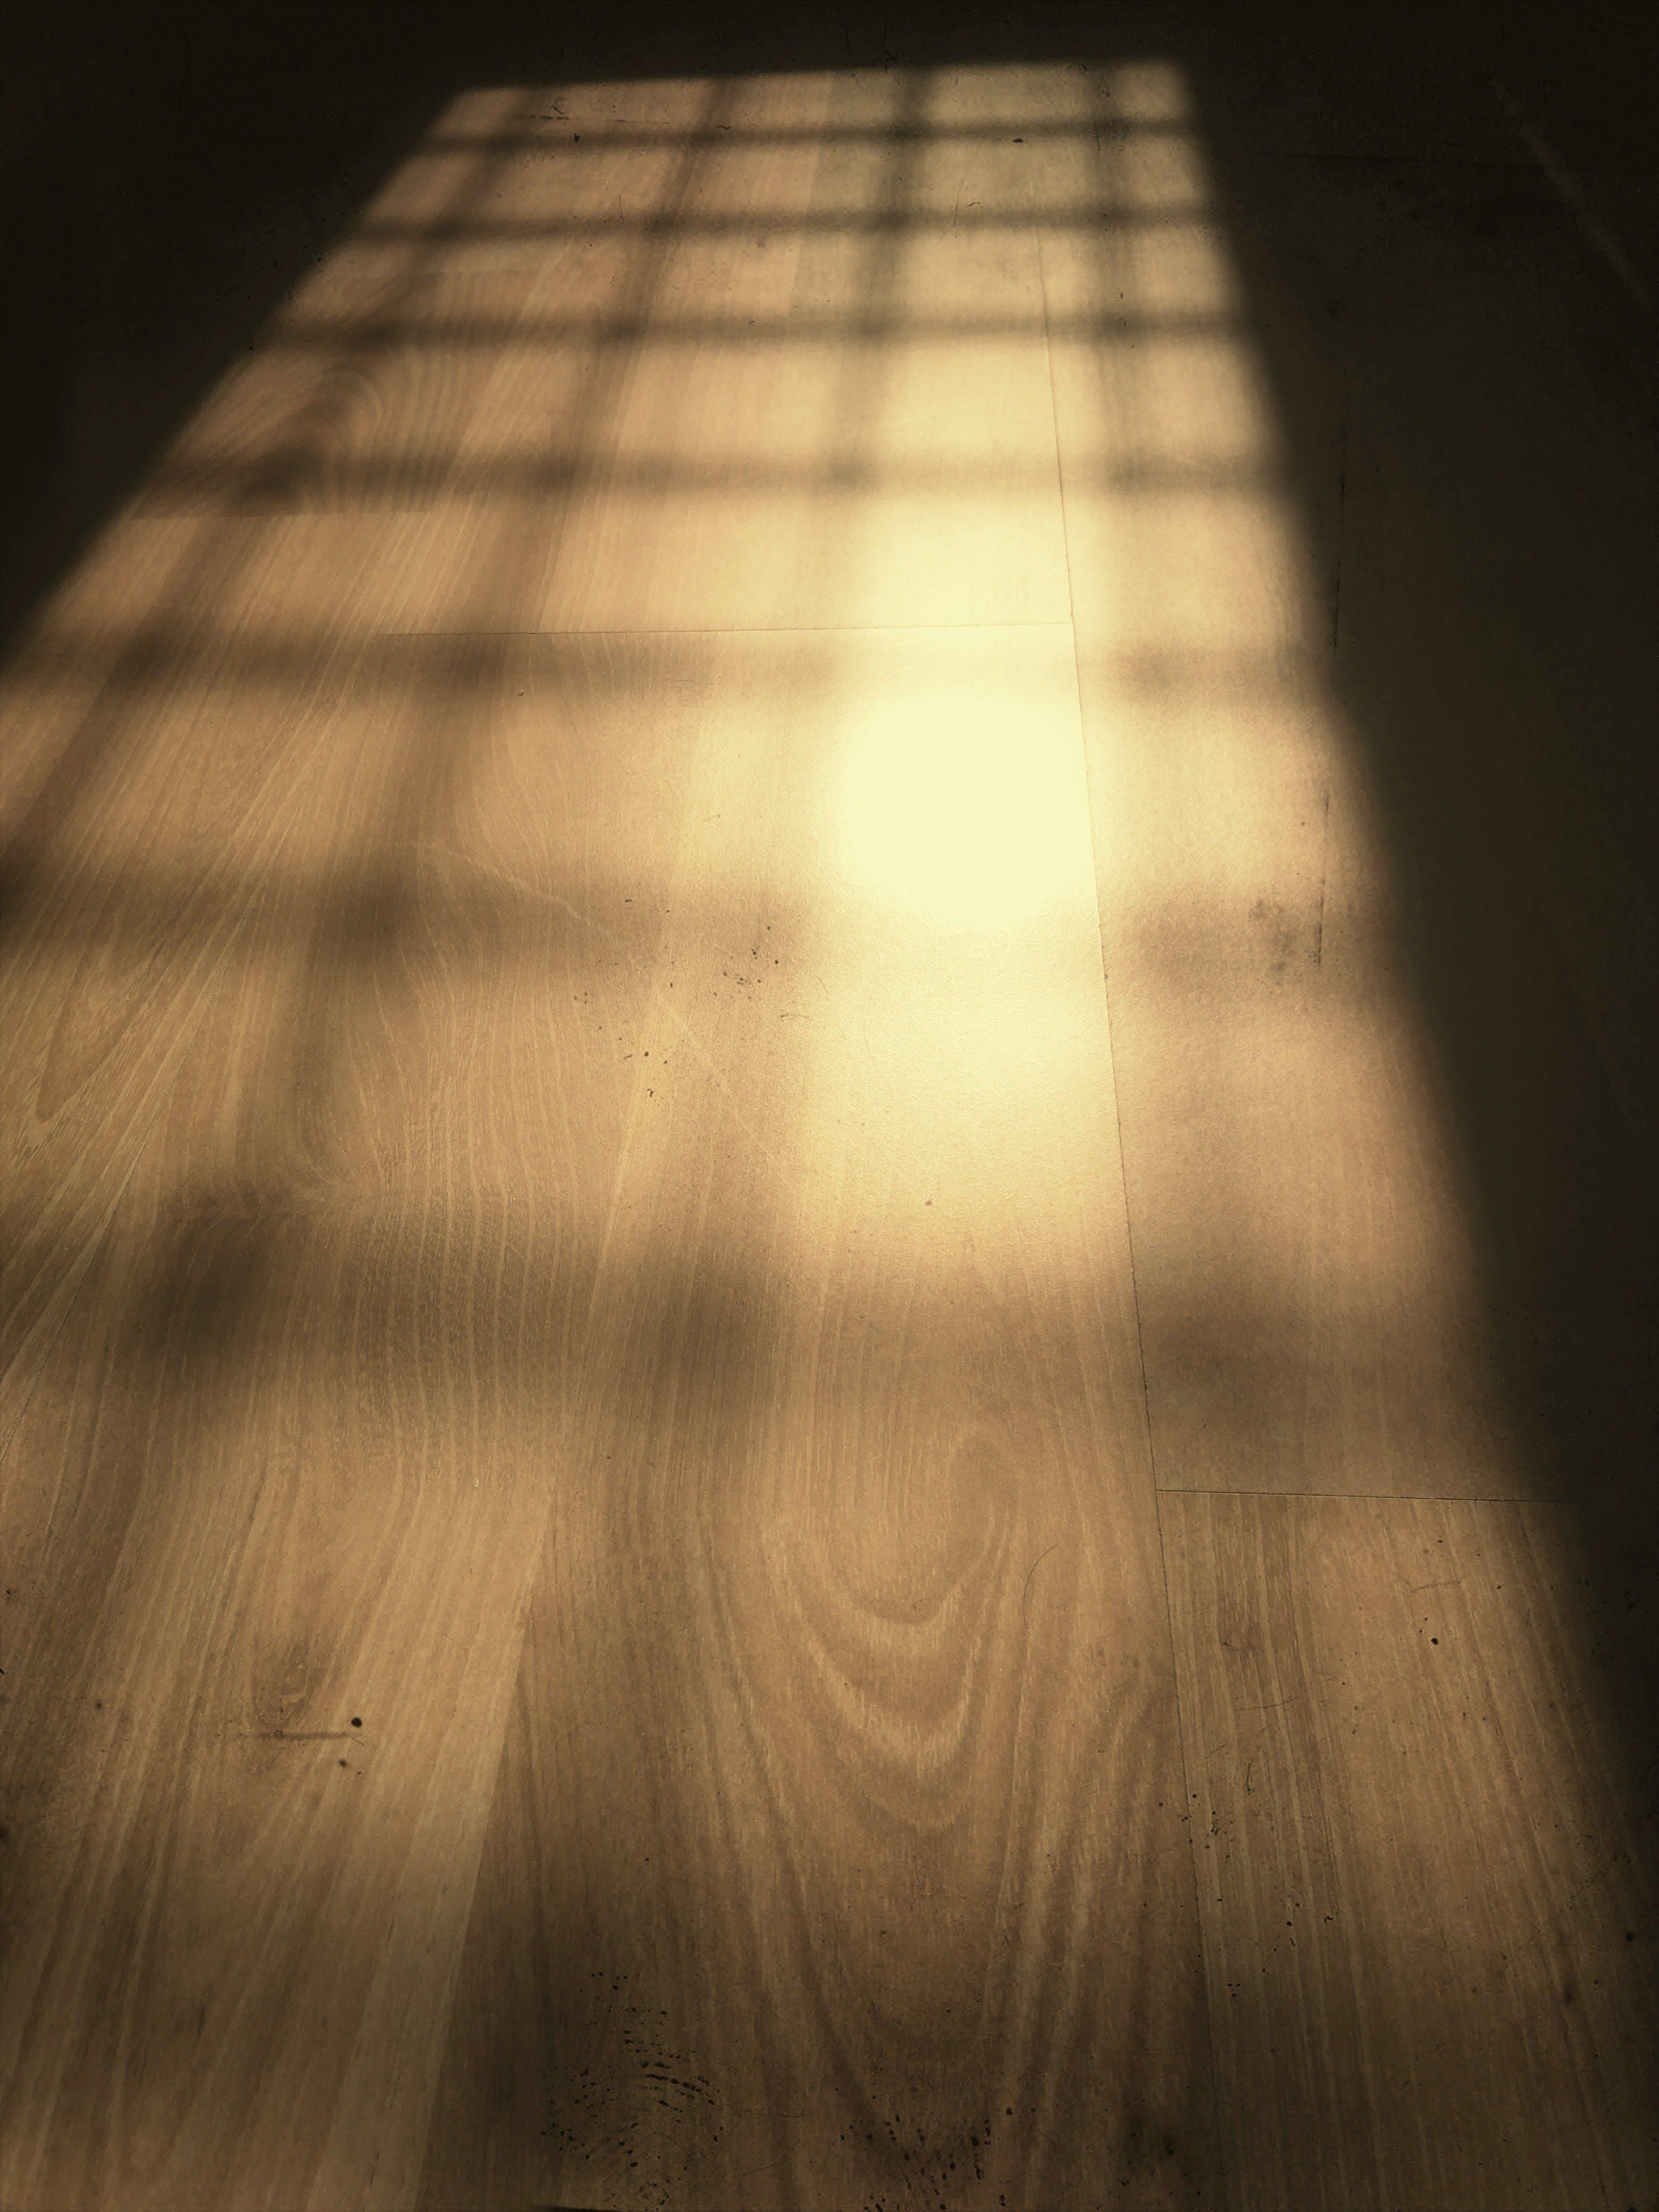 Cast of Shadow on Floor